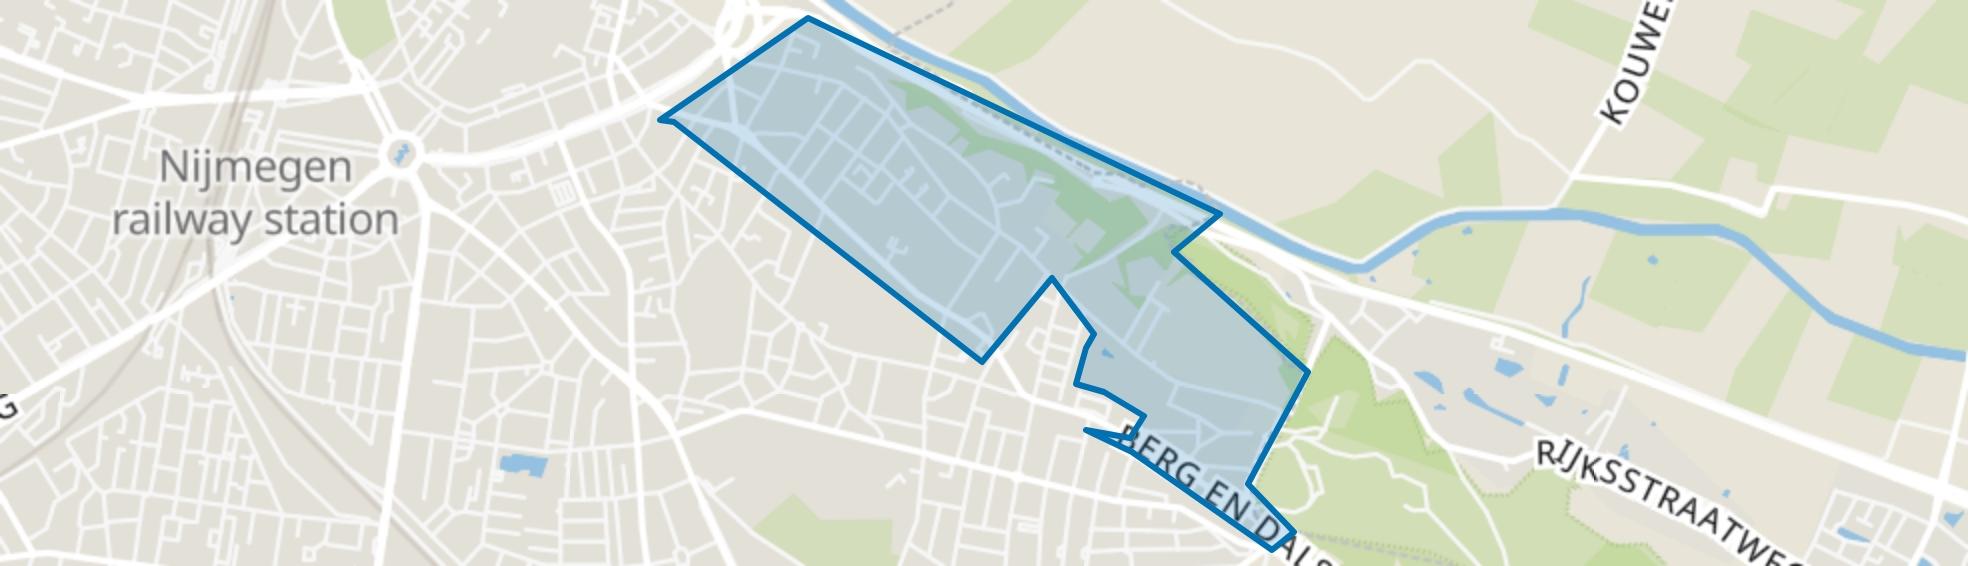 Hunnerberg, Nijmegen map